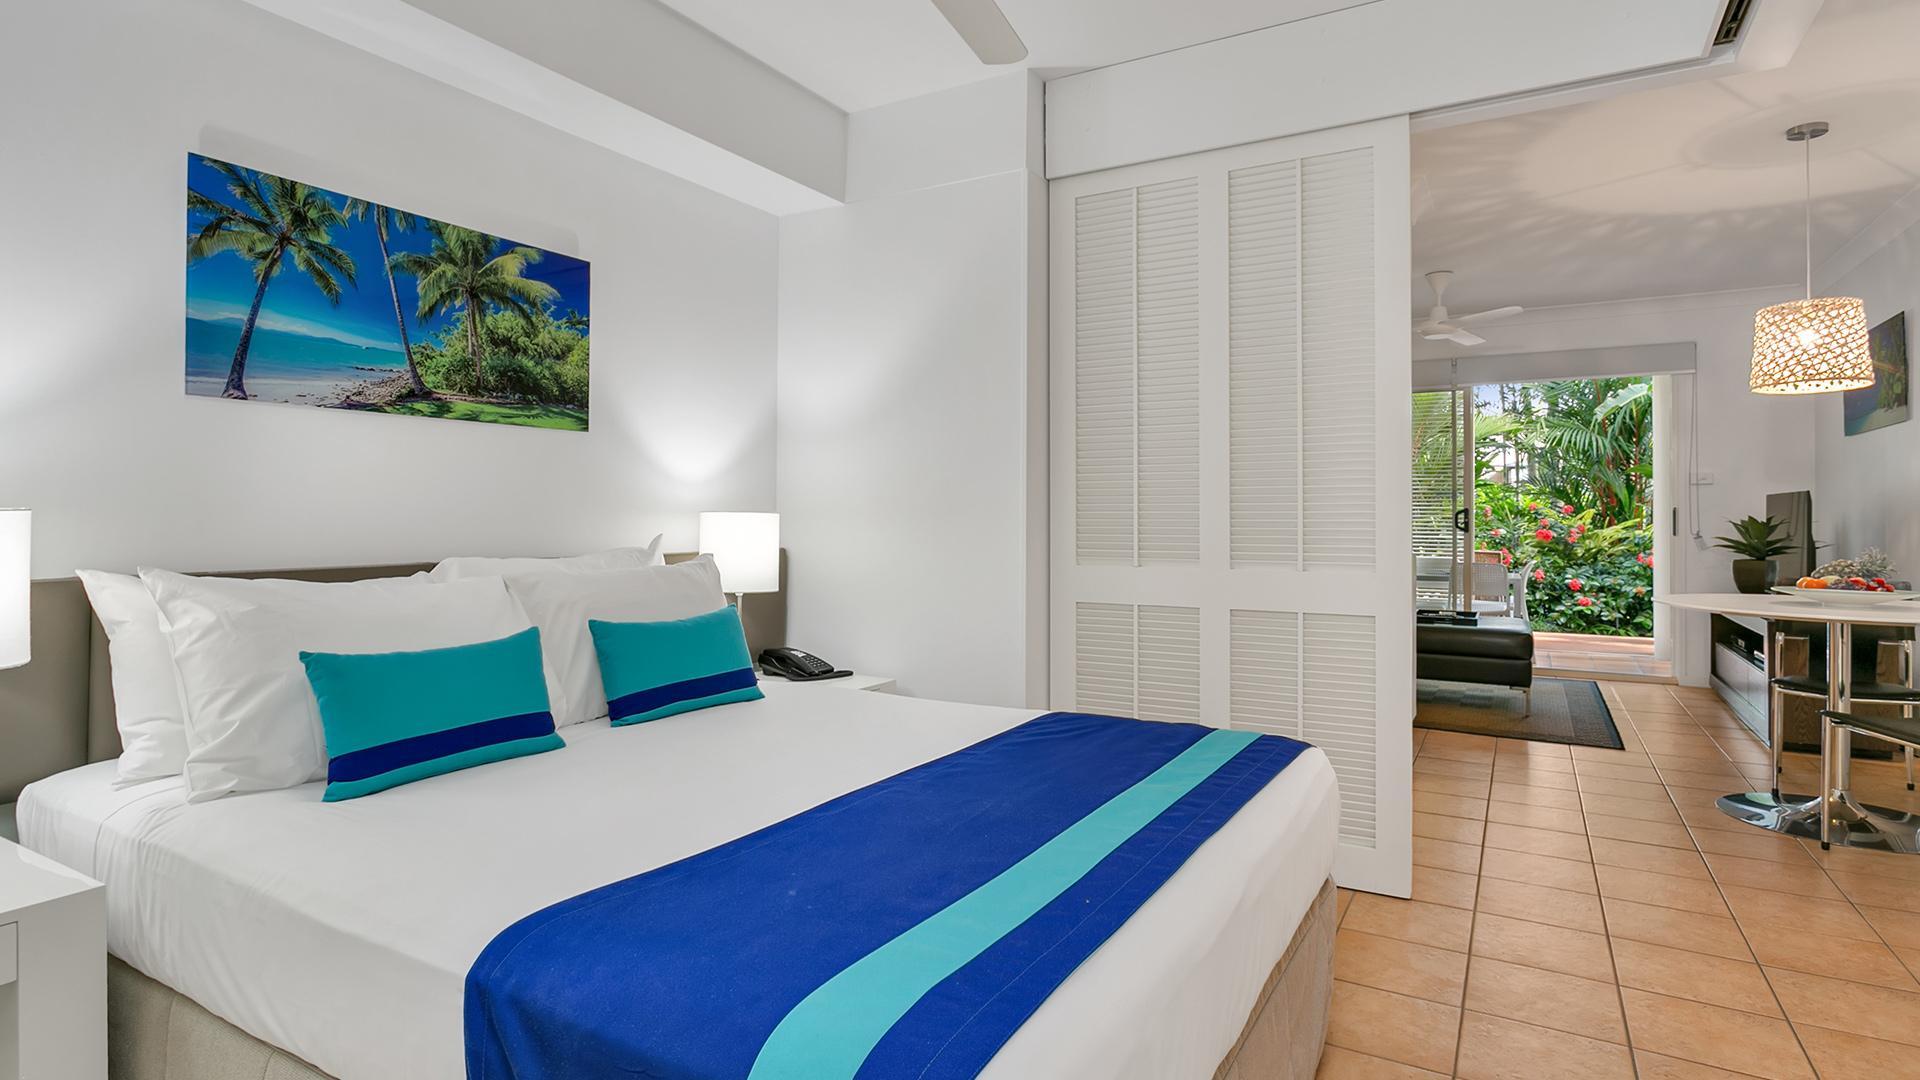 One-Bedroom Apartment July 2020 image 1 at Port Douglas Apartments by Douglas Shire, Queensland, Australia